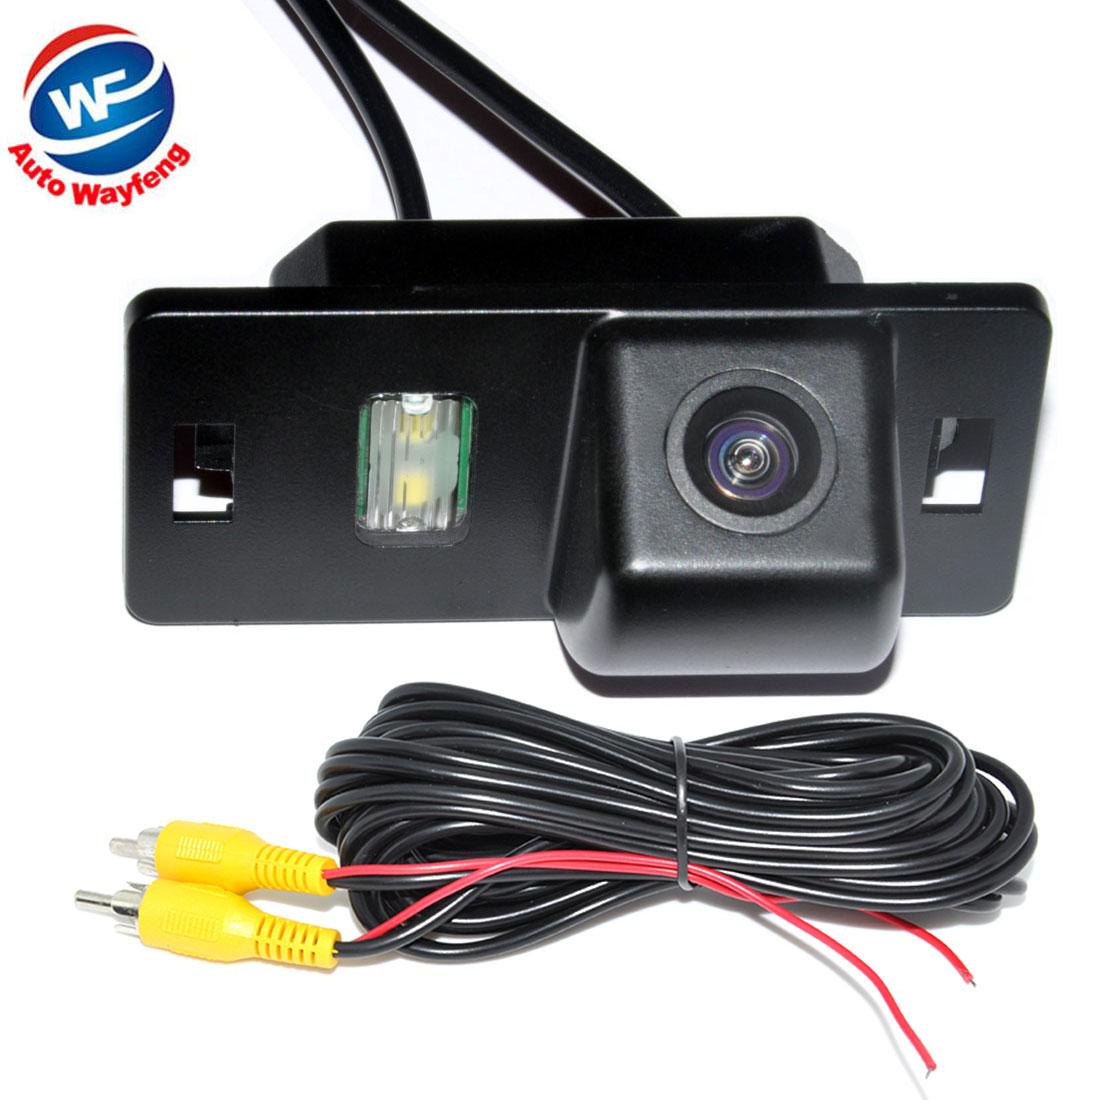 Car Vehicle Rearview Camera For Audi A3/A4(B6/B7/B8) /Q5/Q7/A8/S8 Backup Review Rear View Parking Reversing Camera(China (Mainland))